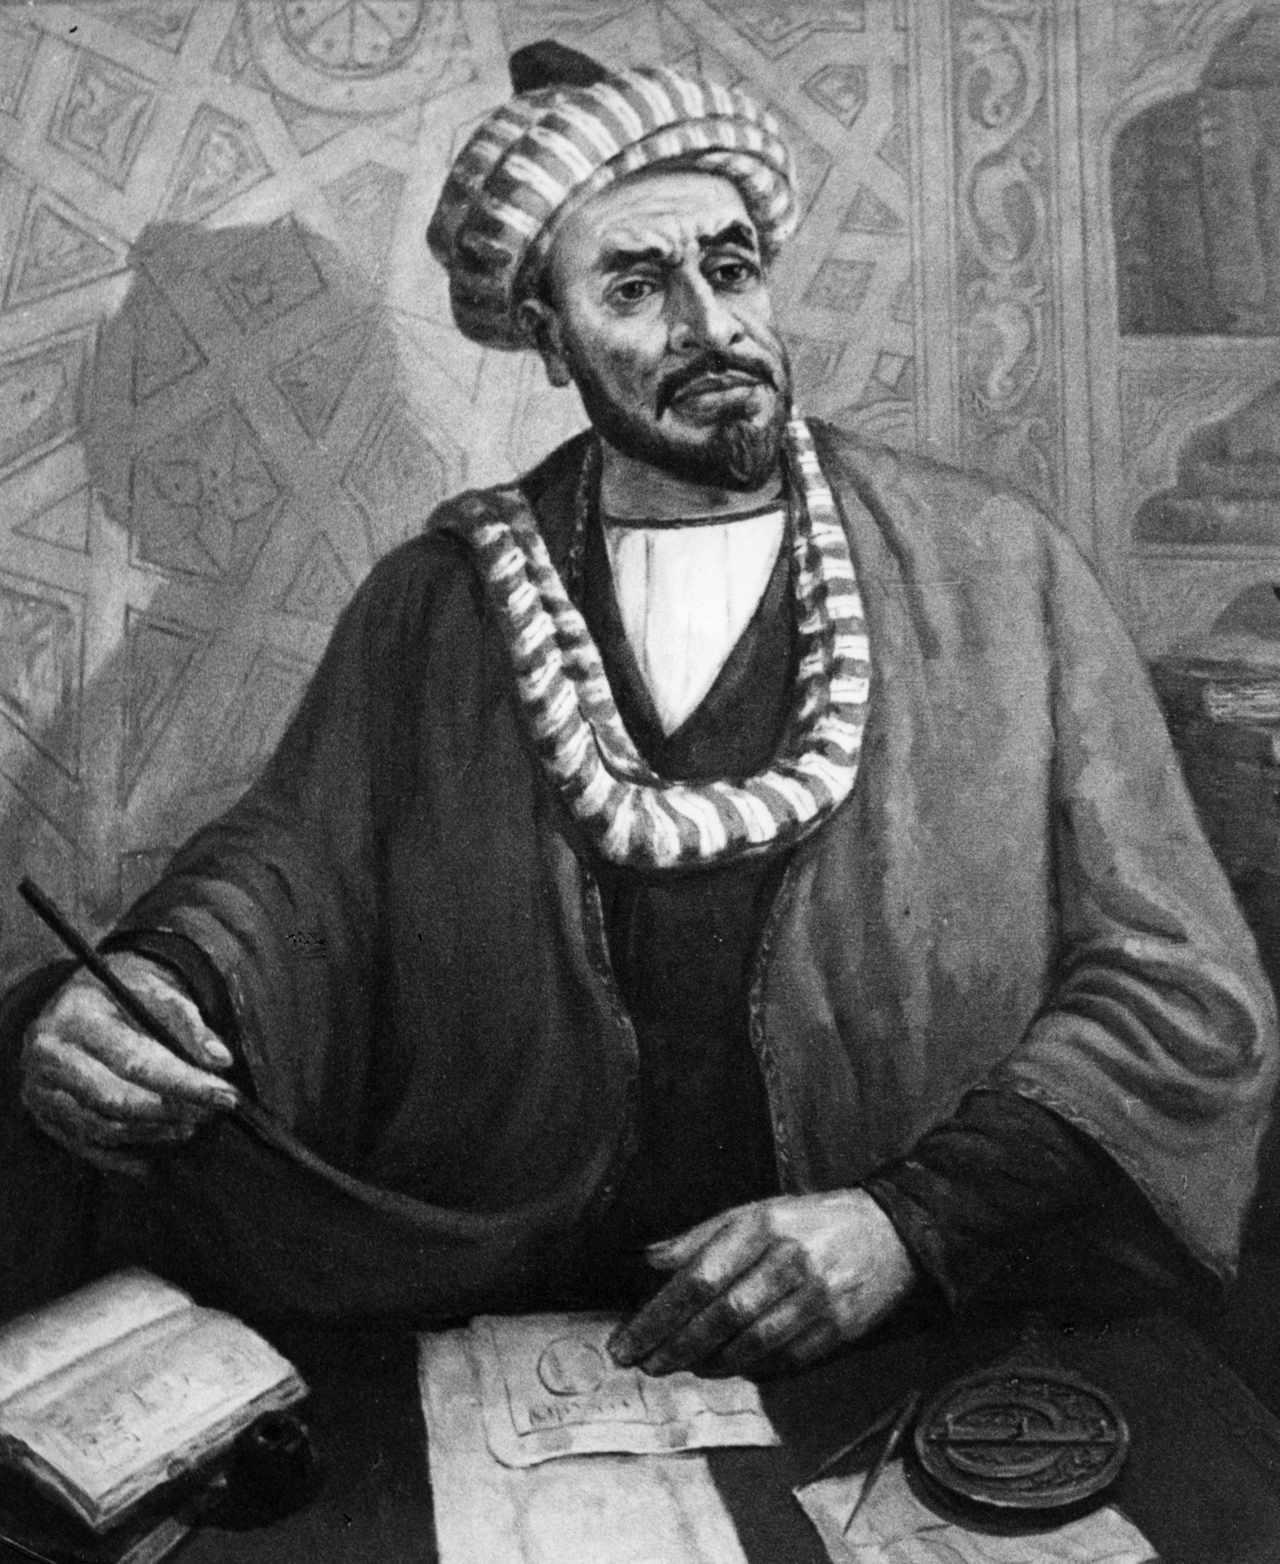 Muhammad al-Khwarizmi © Sovfoto/UIG via Getty Images